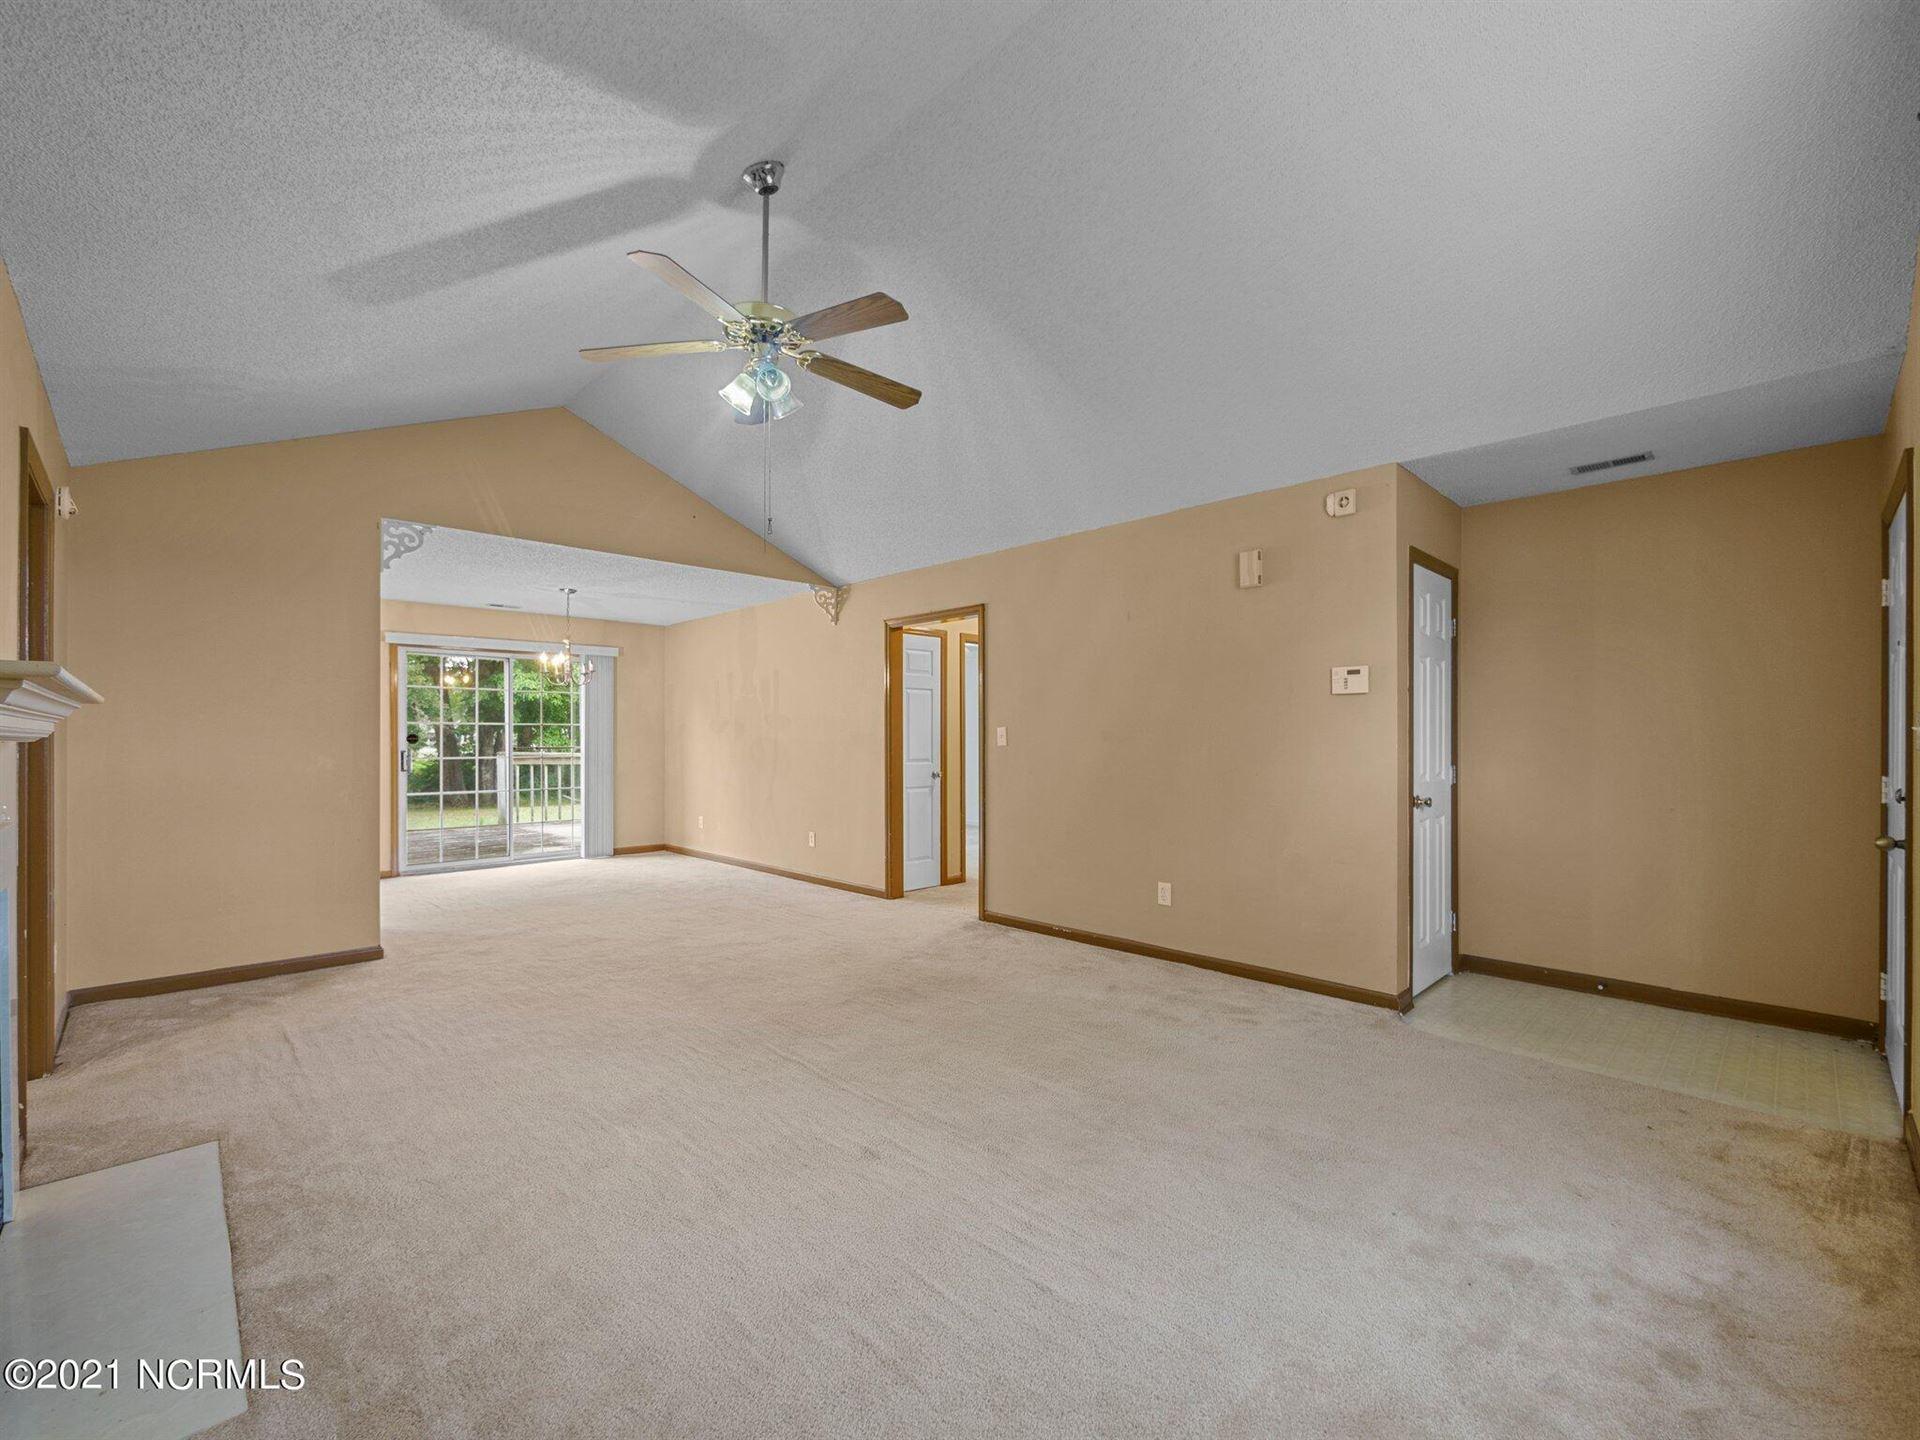 Photo of 359 Running Road, Jacksonville, NC 28546 (MLS # 100295154)